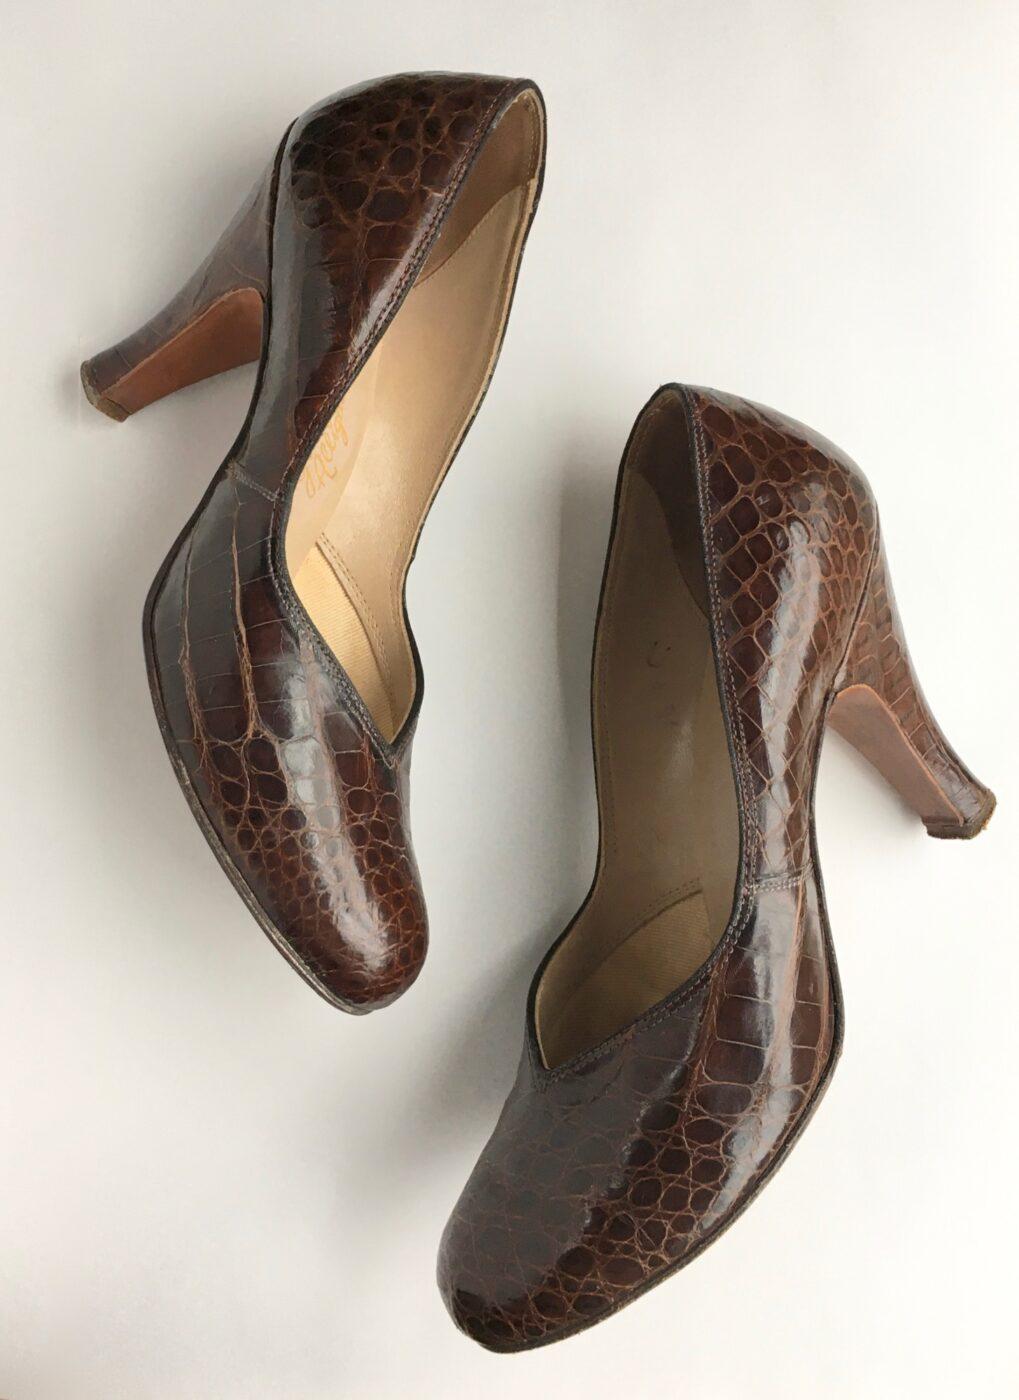 1940s-brown-alligator-pumps-heels-shoes